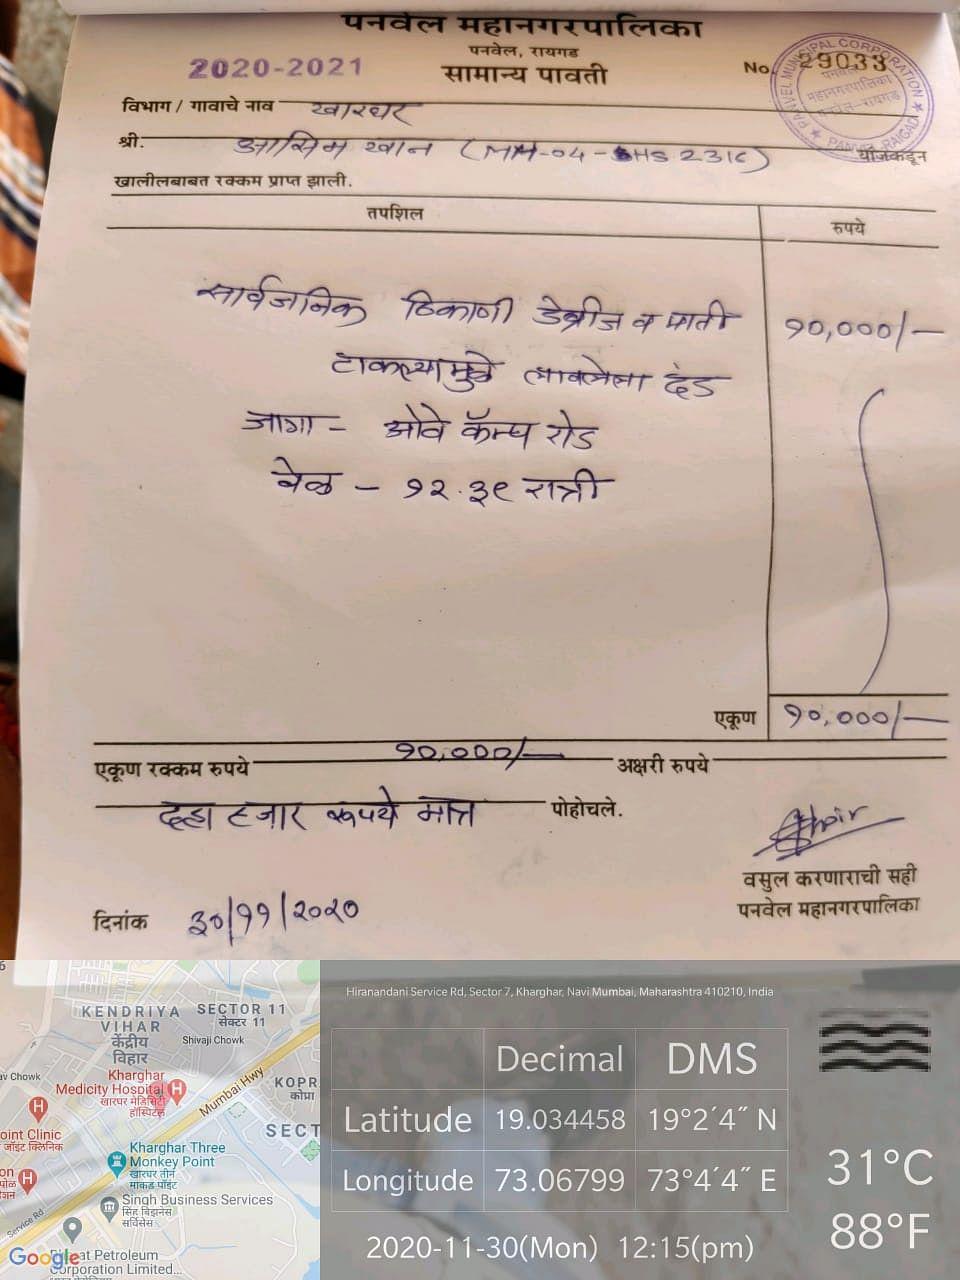 Navi Mumbai: Trucks from Mumbai fined for dumping debris in Kharghar